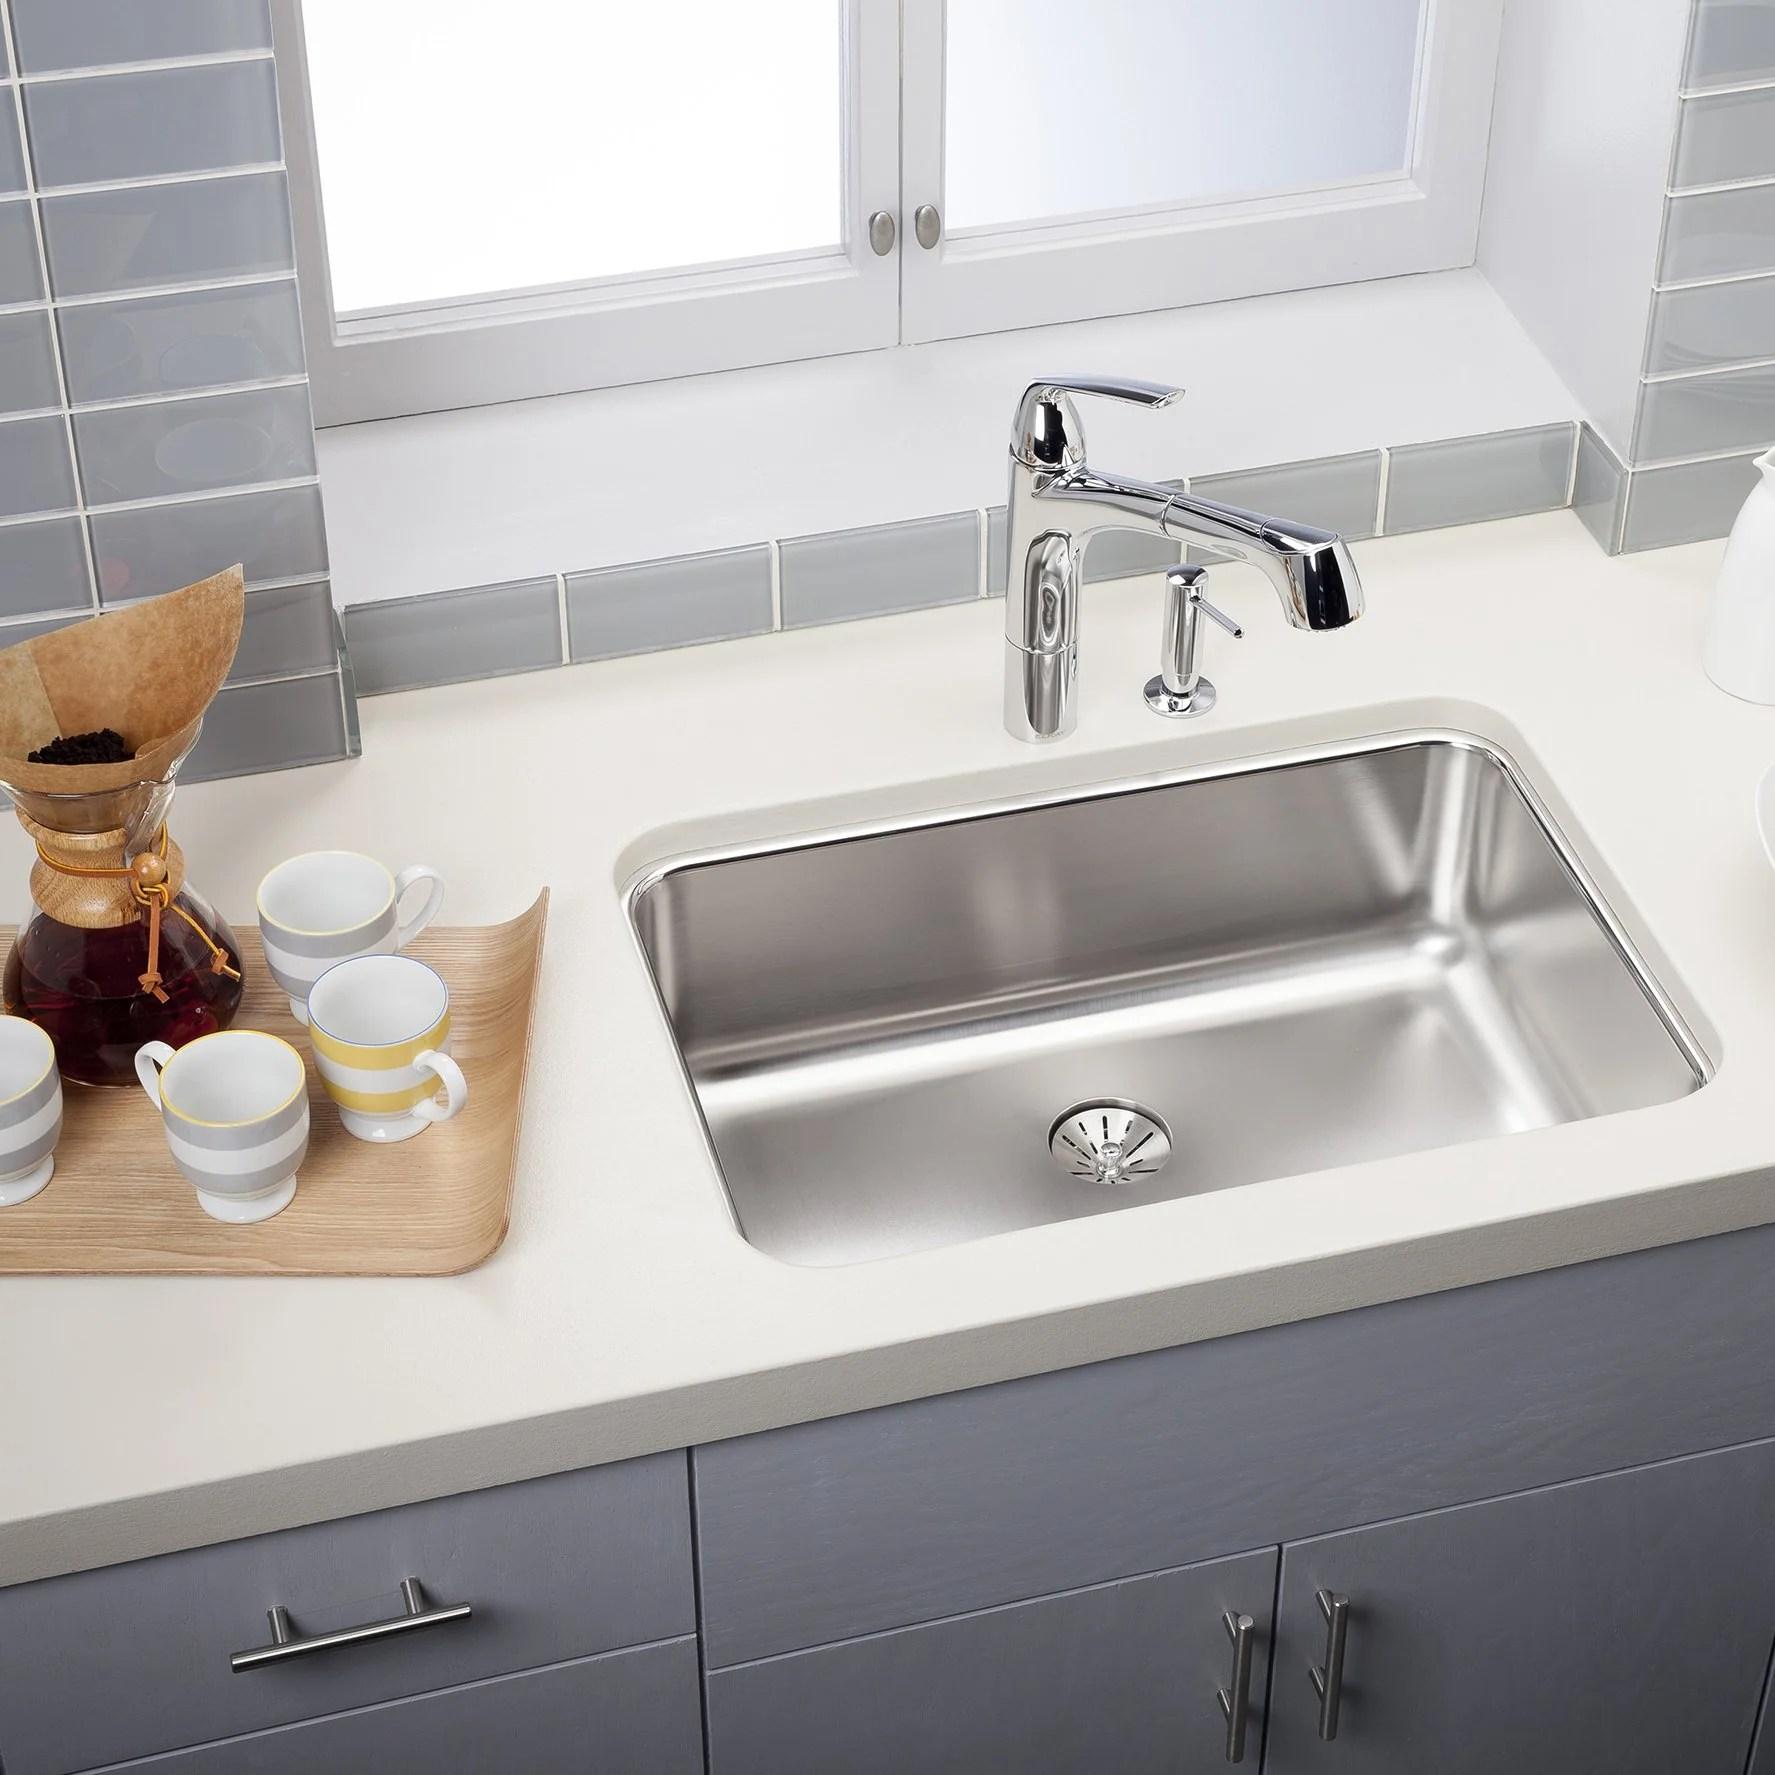 elkay eluh2416pd lustertone 26 5 single bowl 18 gauge undermount kitchen sink free shipping bath4all